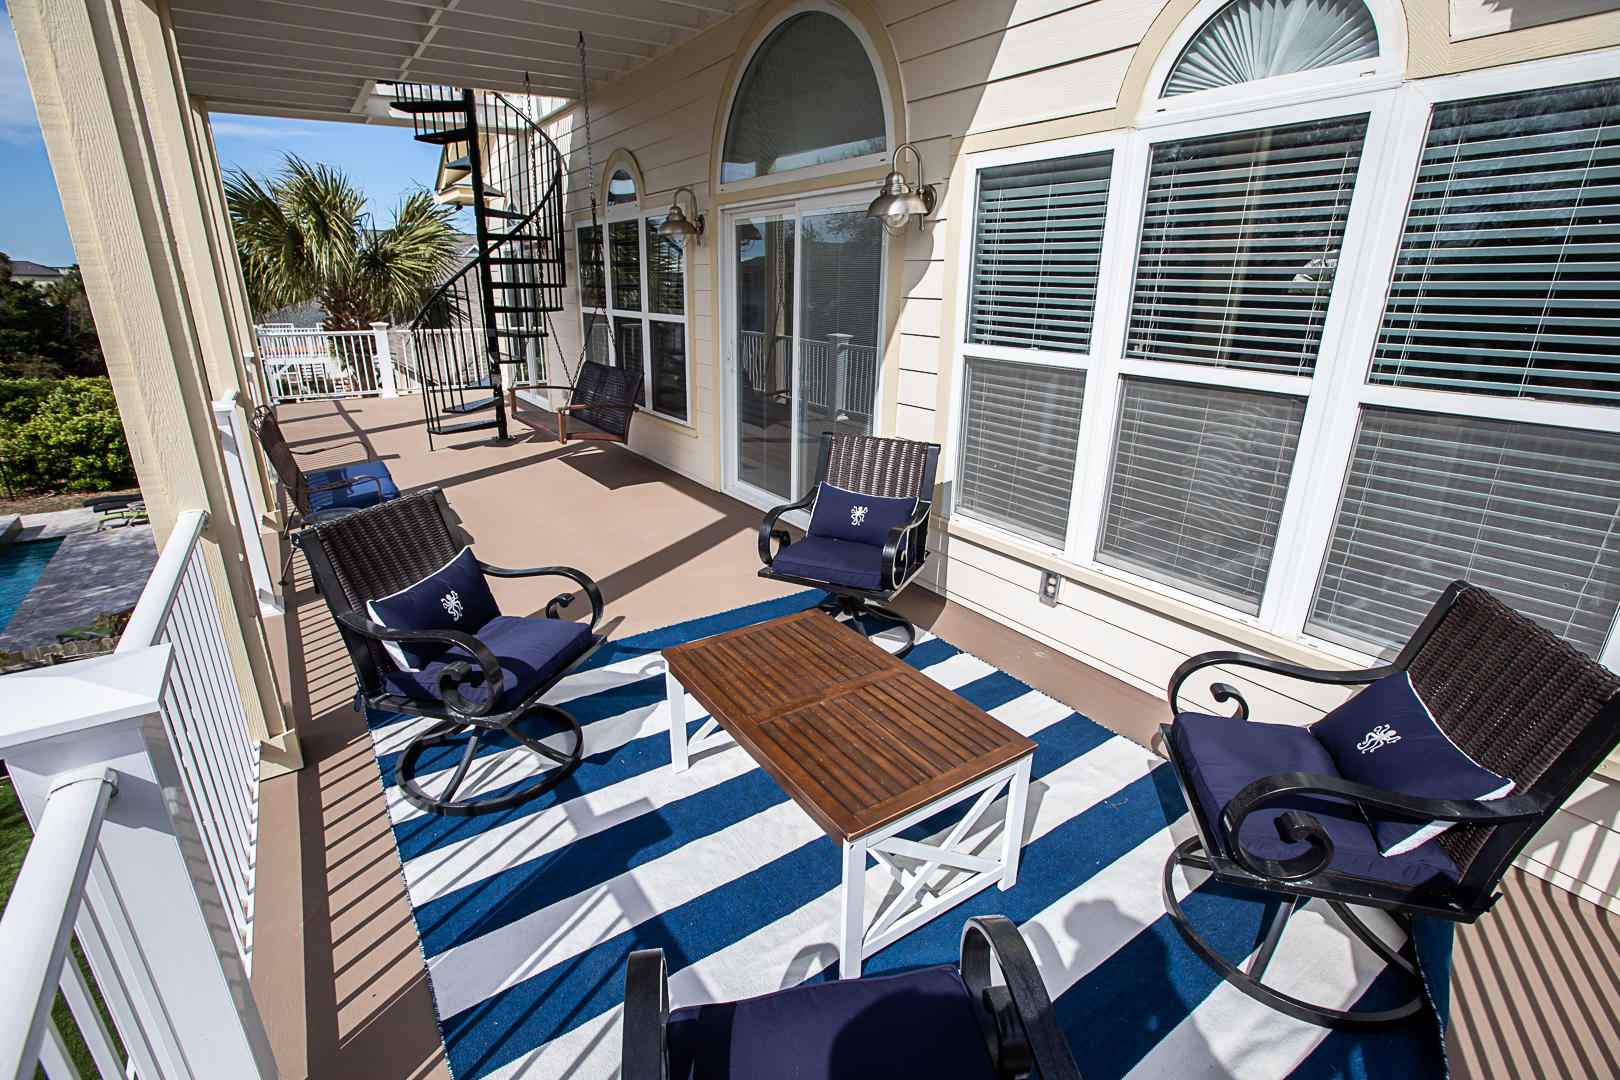 Isle of Palms Homes For Sale - 712 Carolina, Isle of Palms, SC - 16